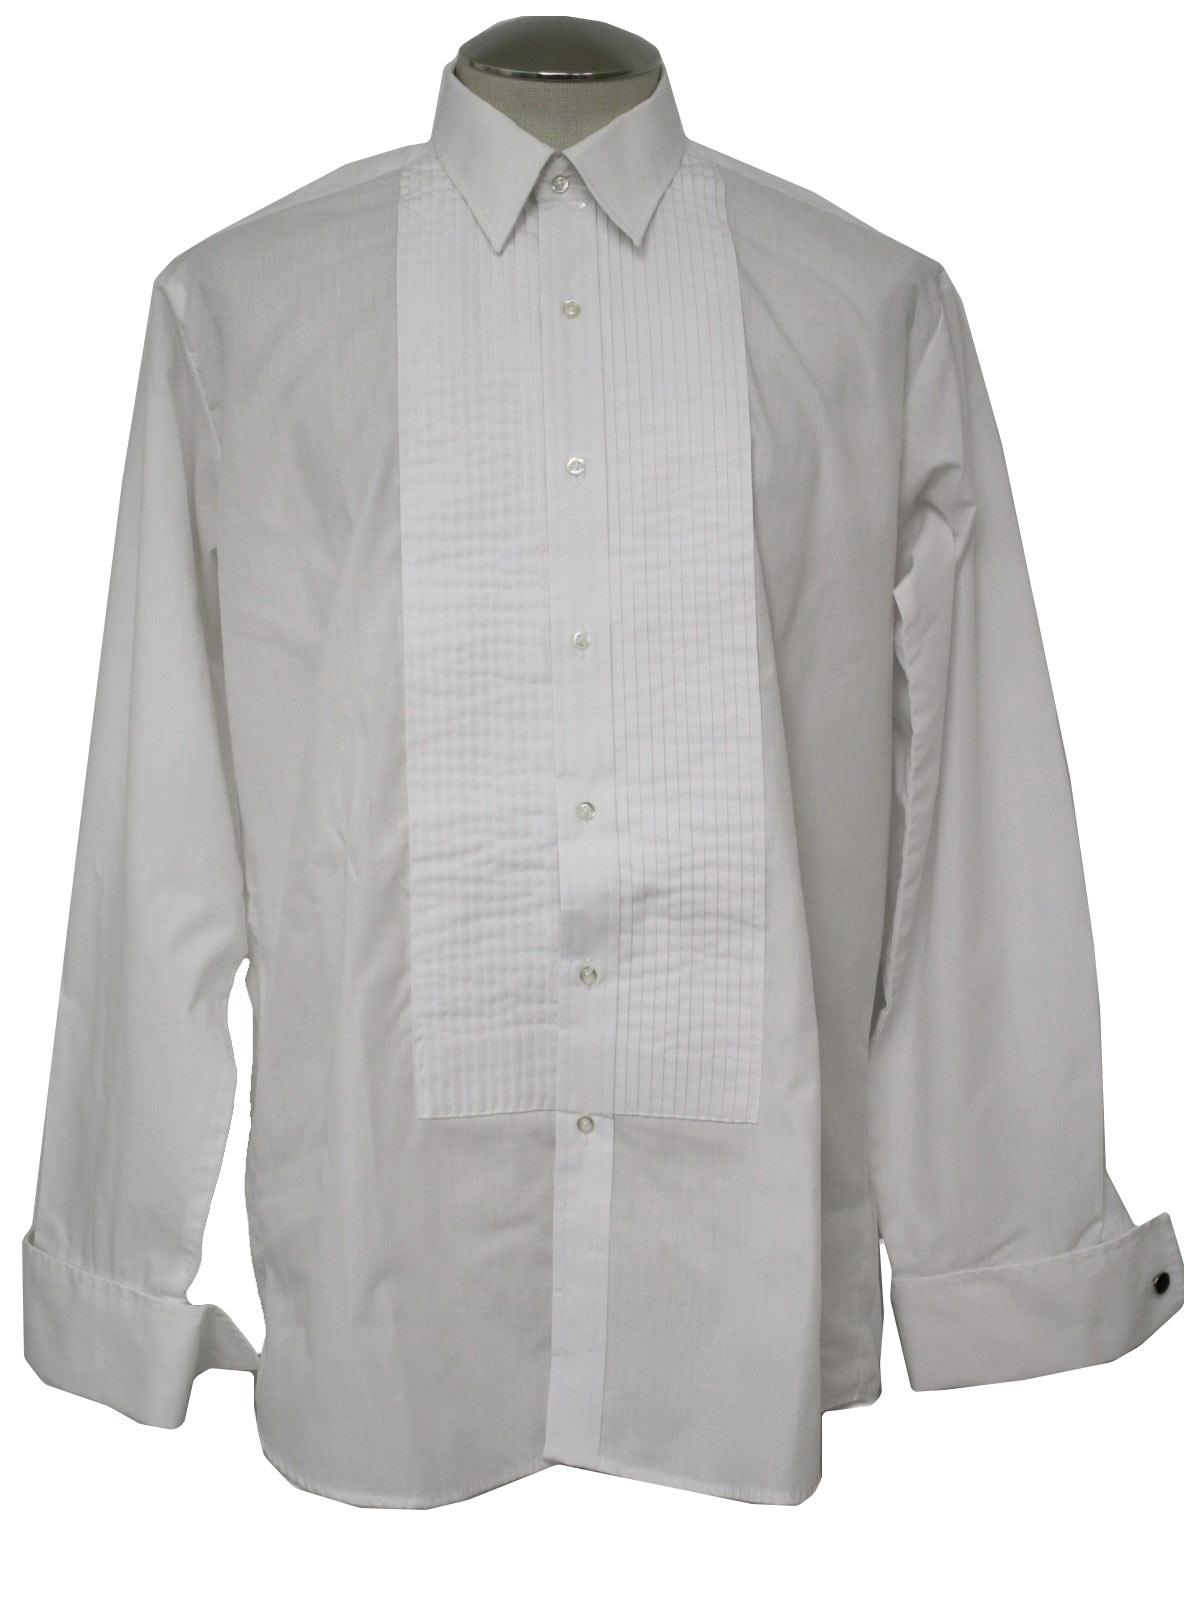 80 39 S Aetna Shirt Shirt 80s Aetna Shirt Mens White